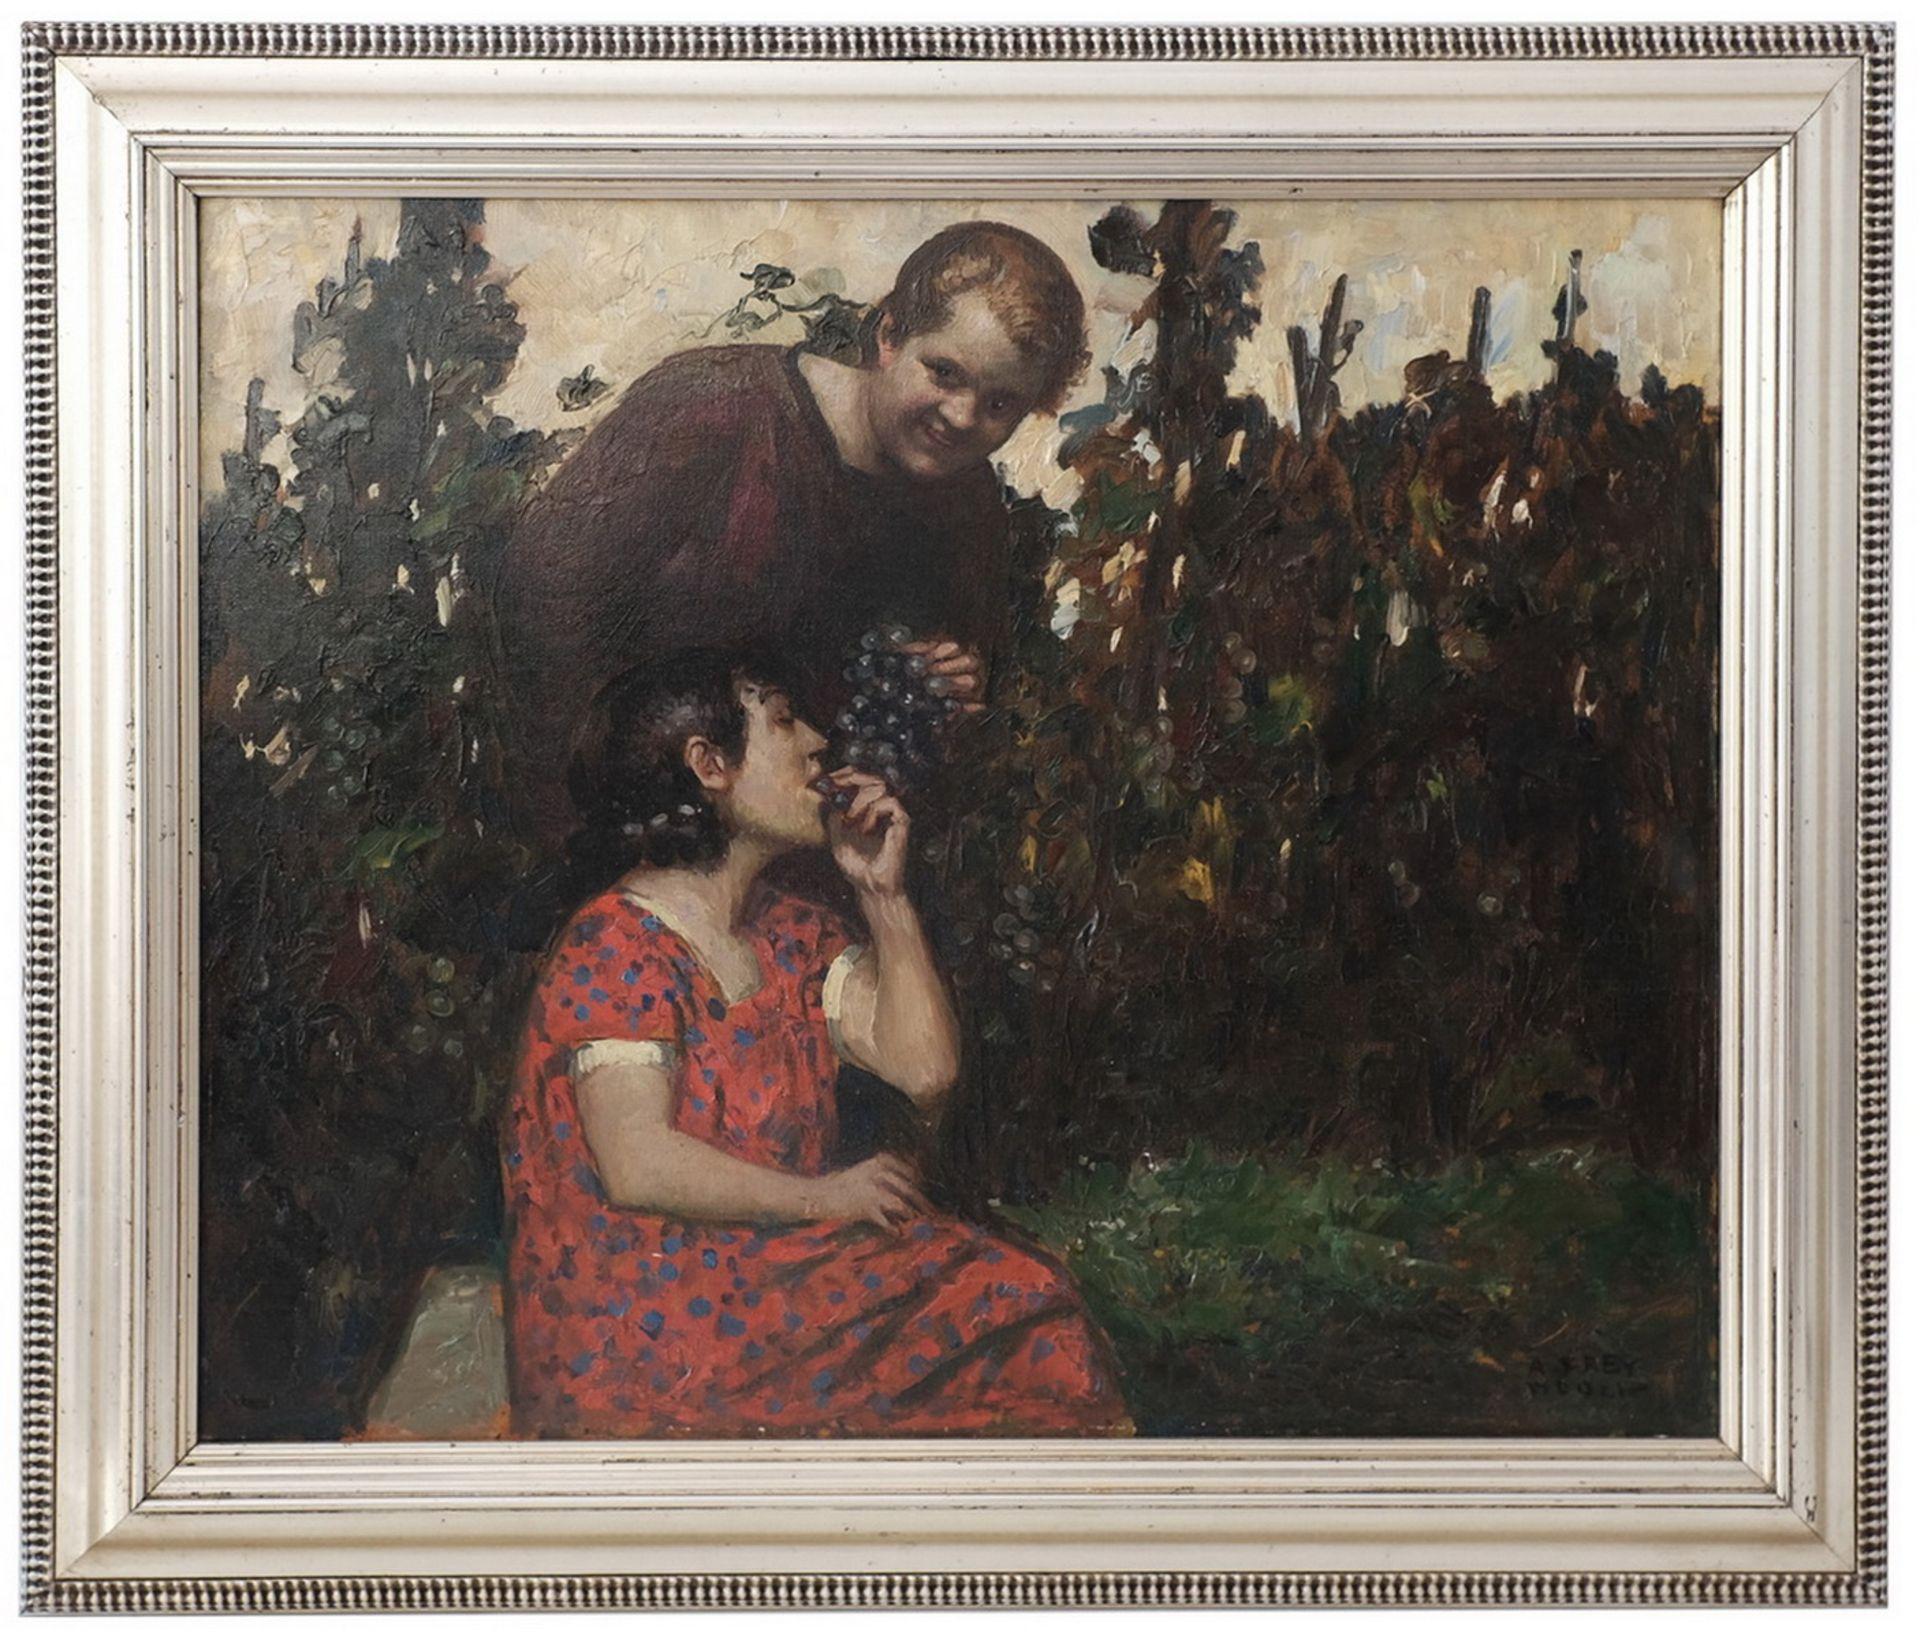 Frey-Moock, Adolf. Grapevine. [The first half of the ХХ century]. Oil on canvas. 50,5x60 cm.<br>Sign - Bild 3 aus 4